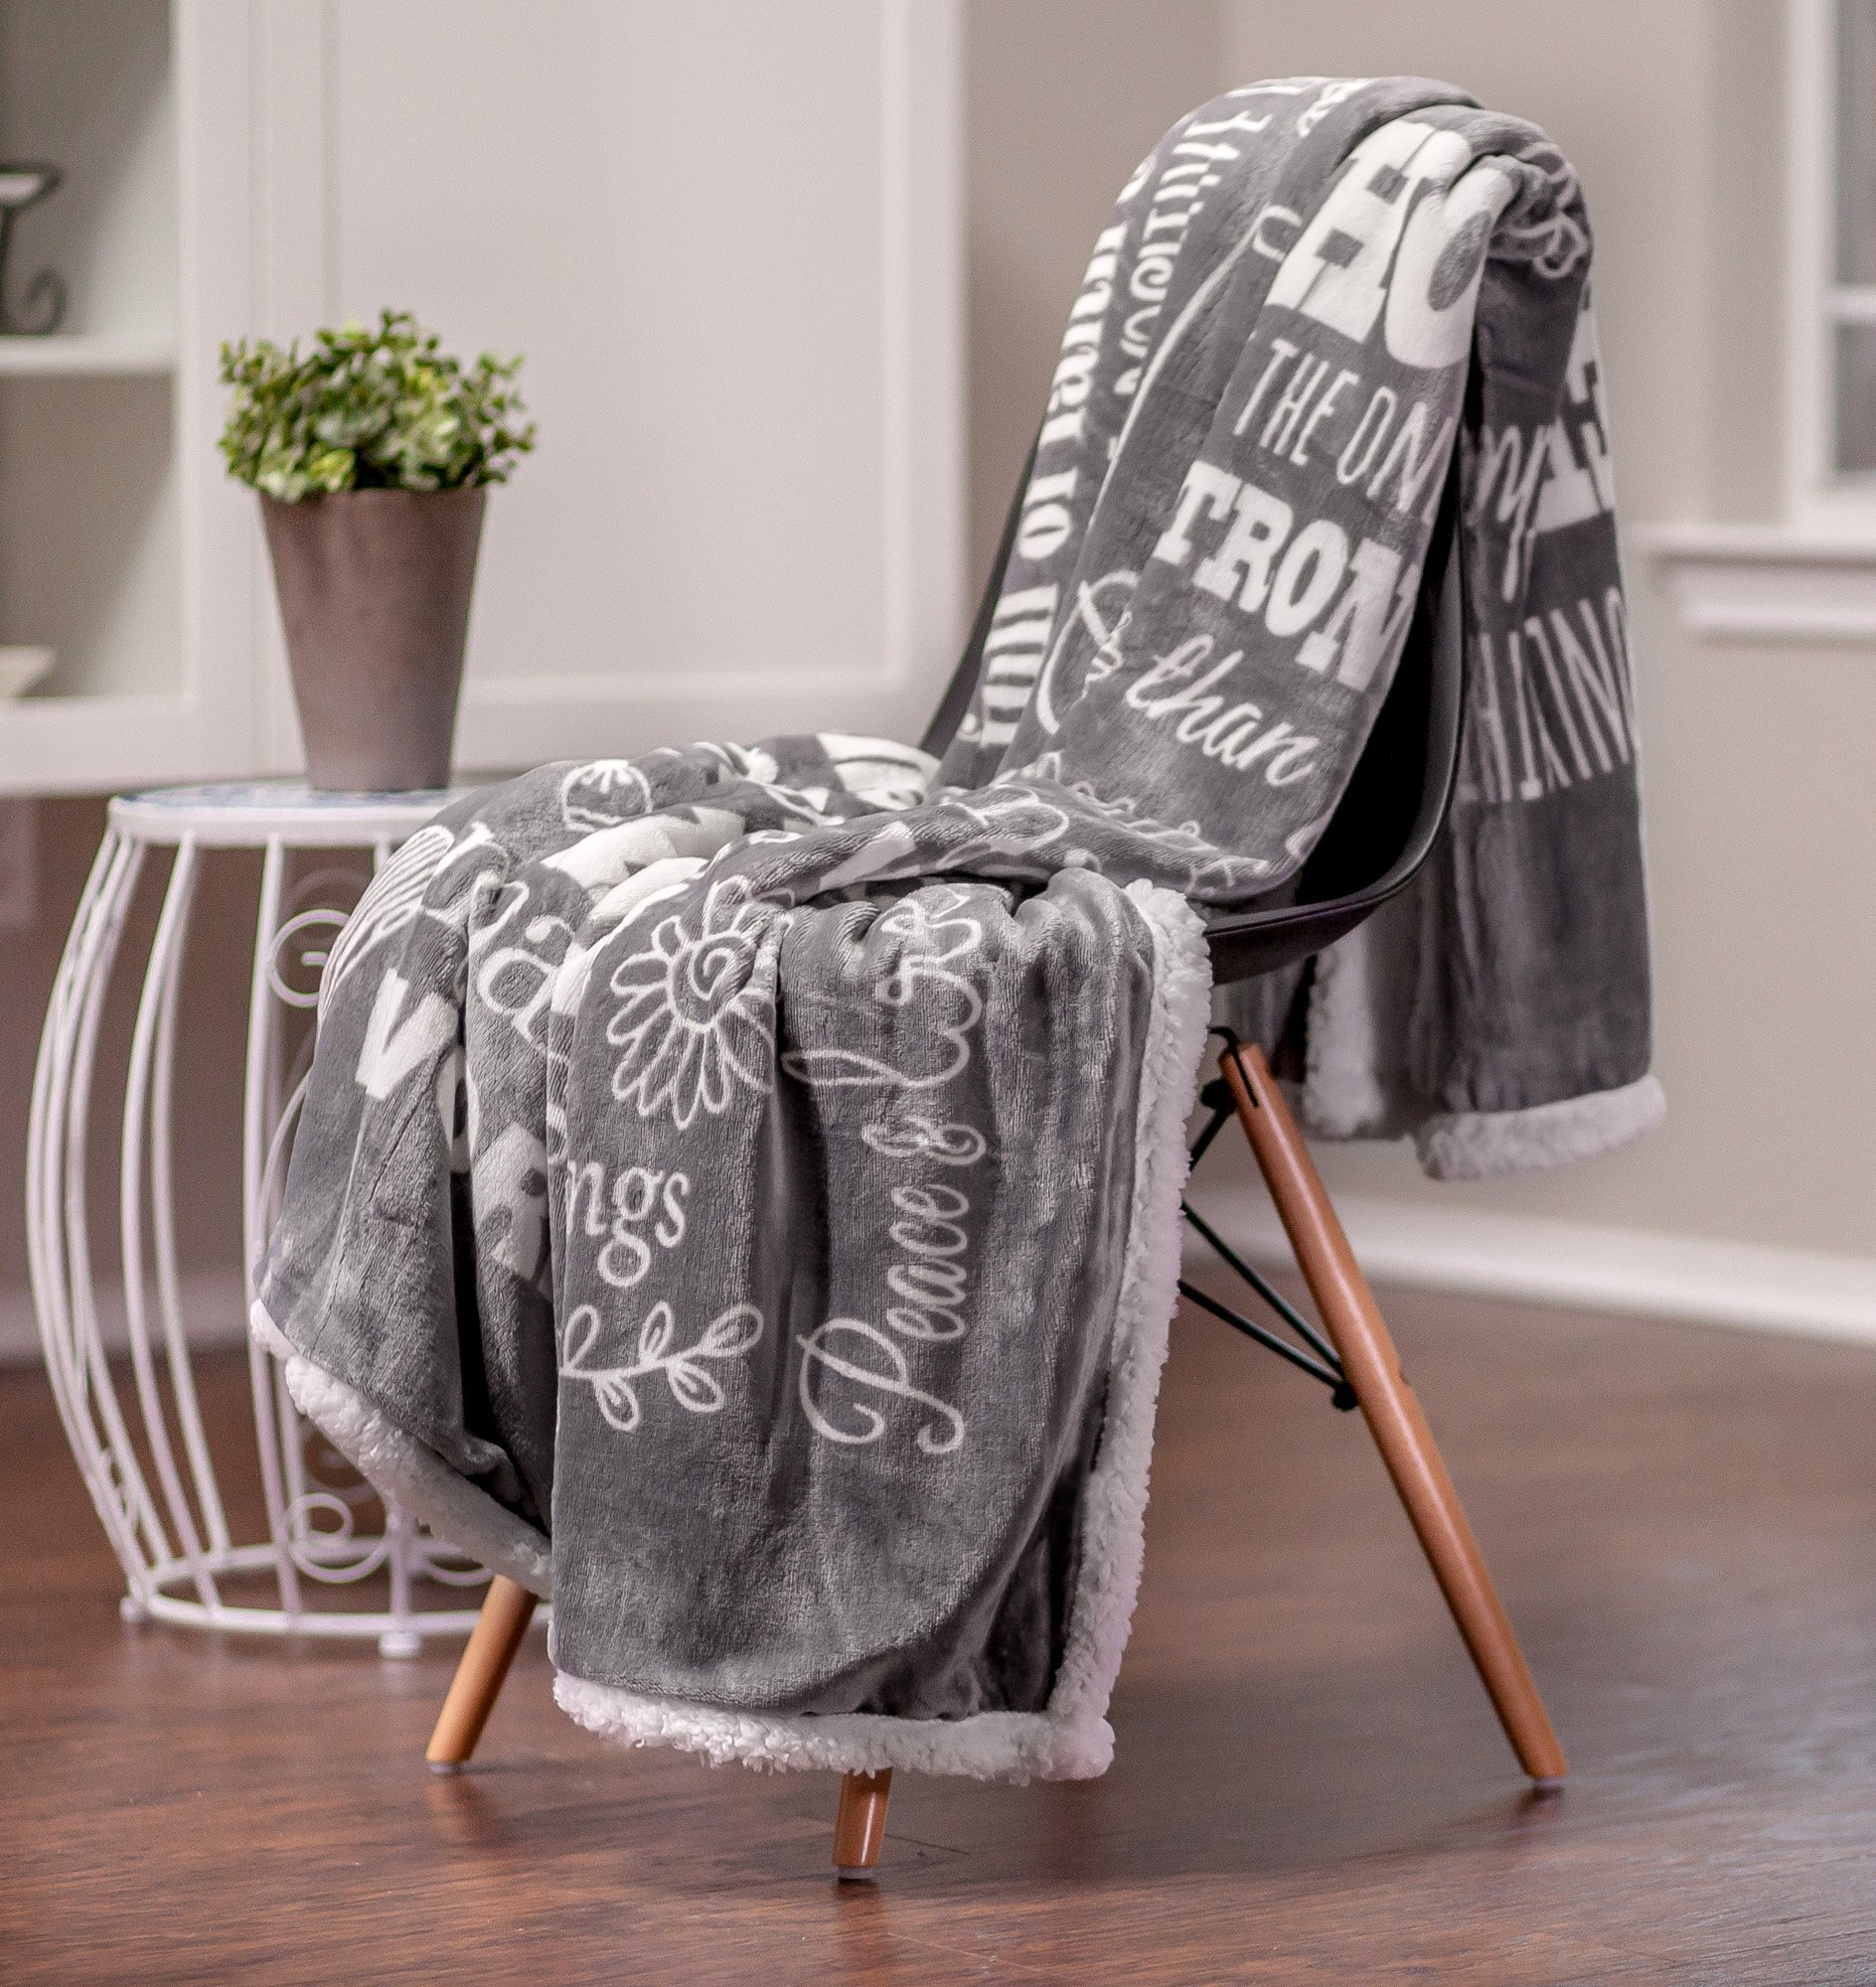 Chanasya Hope and Faith Inspirational Message Print Super Soft Ultra Plush Cozy Fleece Microfiber Sherpa Posivite Energy Comfort Caring Uplifting Gift Throw Blanket - for Women Men - Grey Blanket by Chanasya (Image #2)